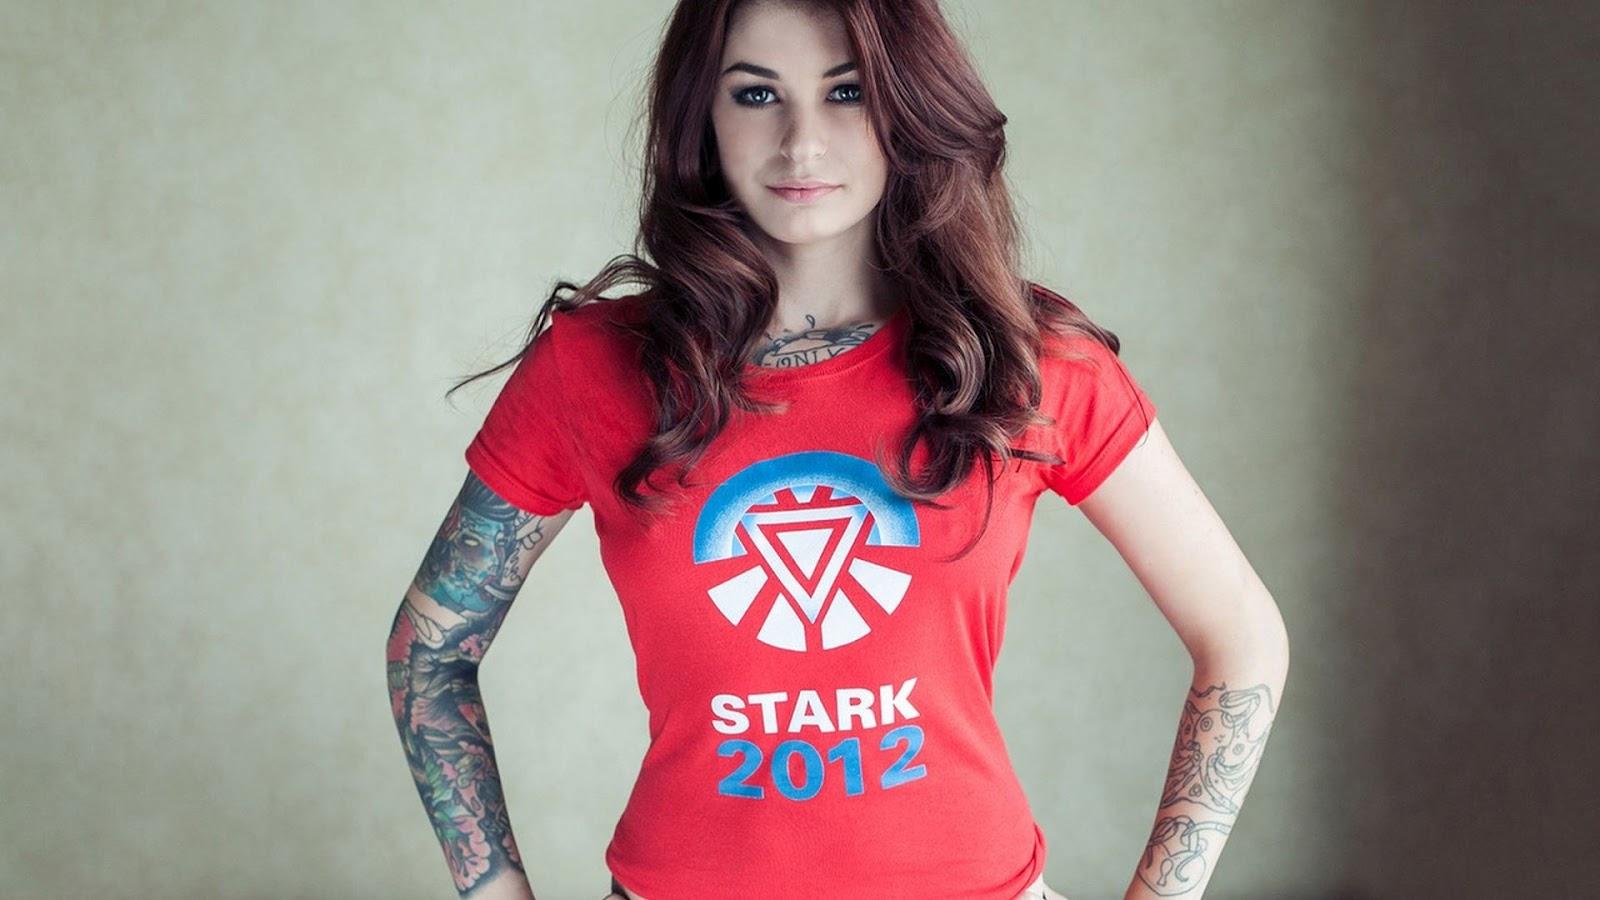 Tattoos-For-Arm-xy-com-TattooDesigns-Tatto-tattoideas-wallpaper-wpc9009676